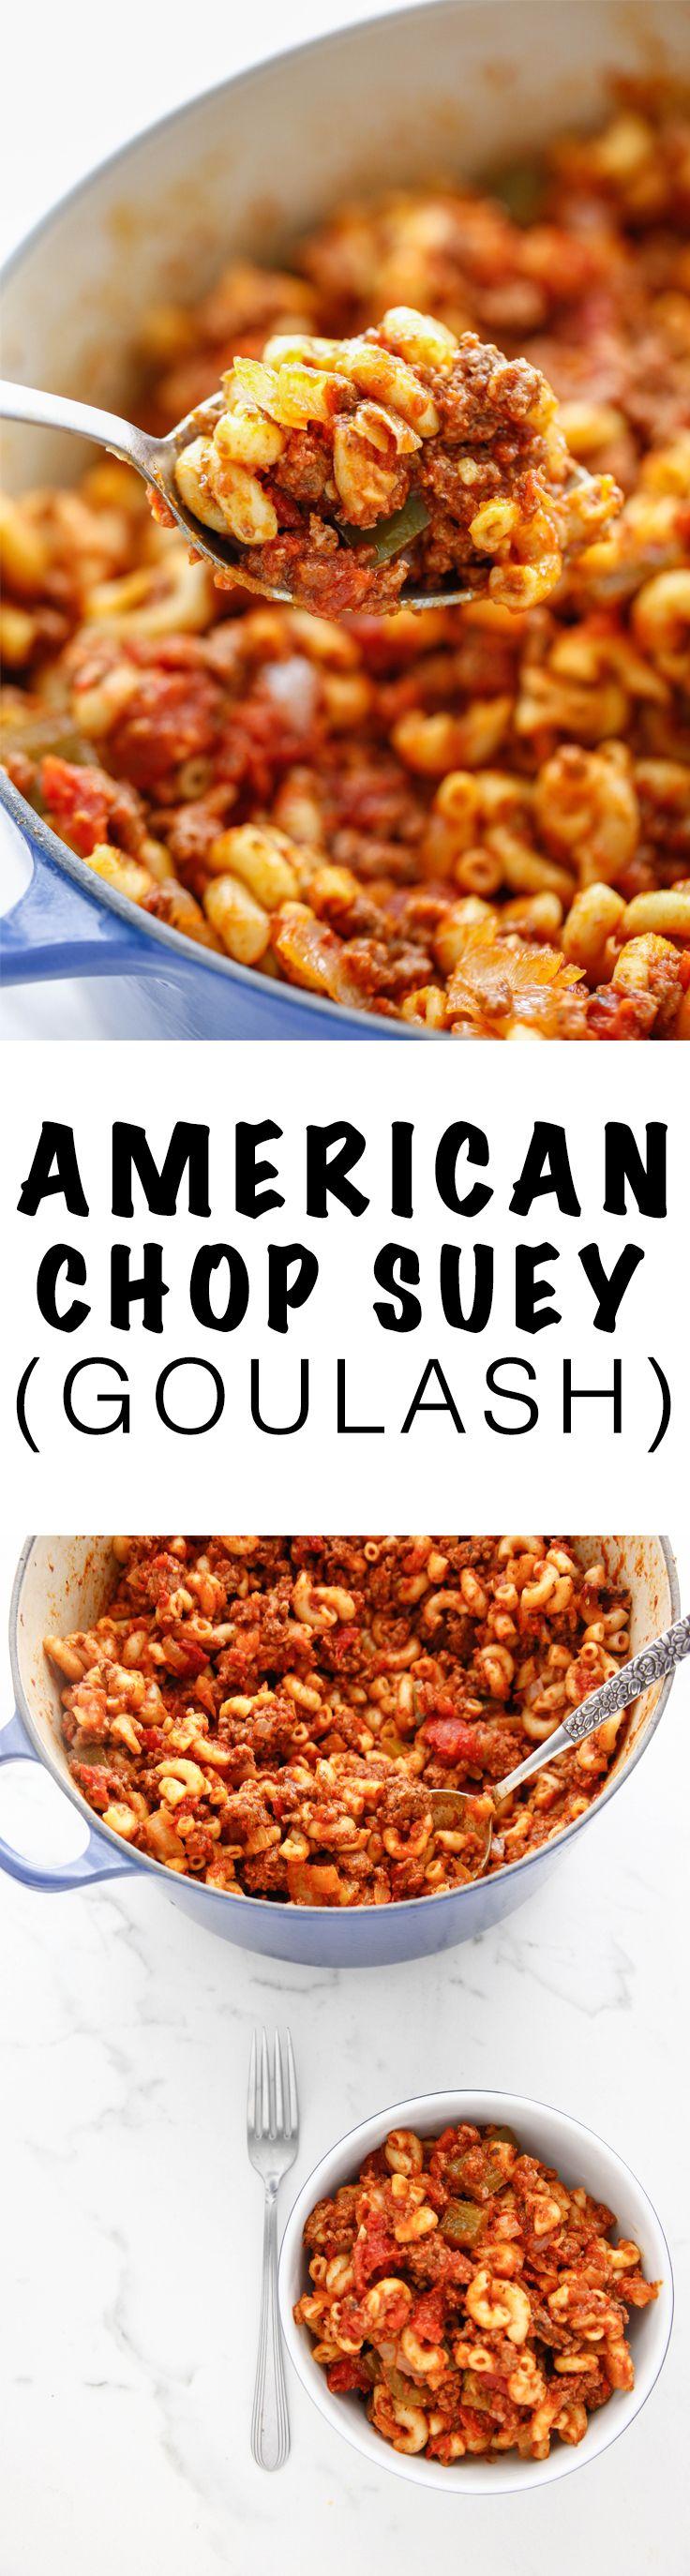 American Chop Suey aka Goulash from @thebrooklyncook via @thebrooklyncook